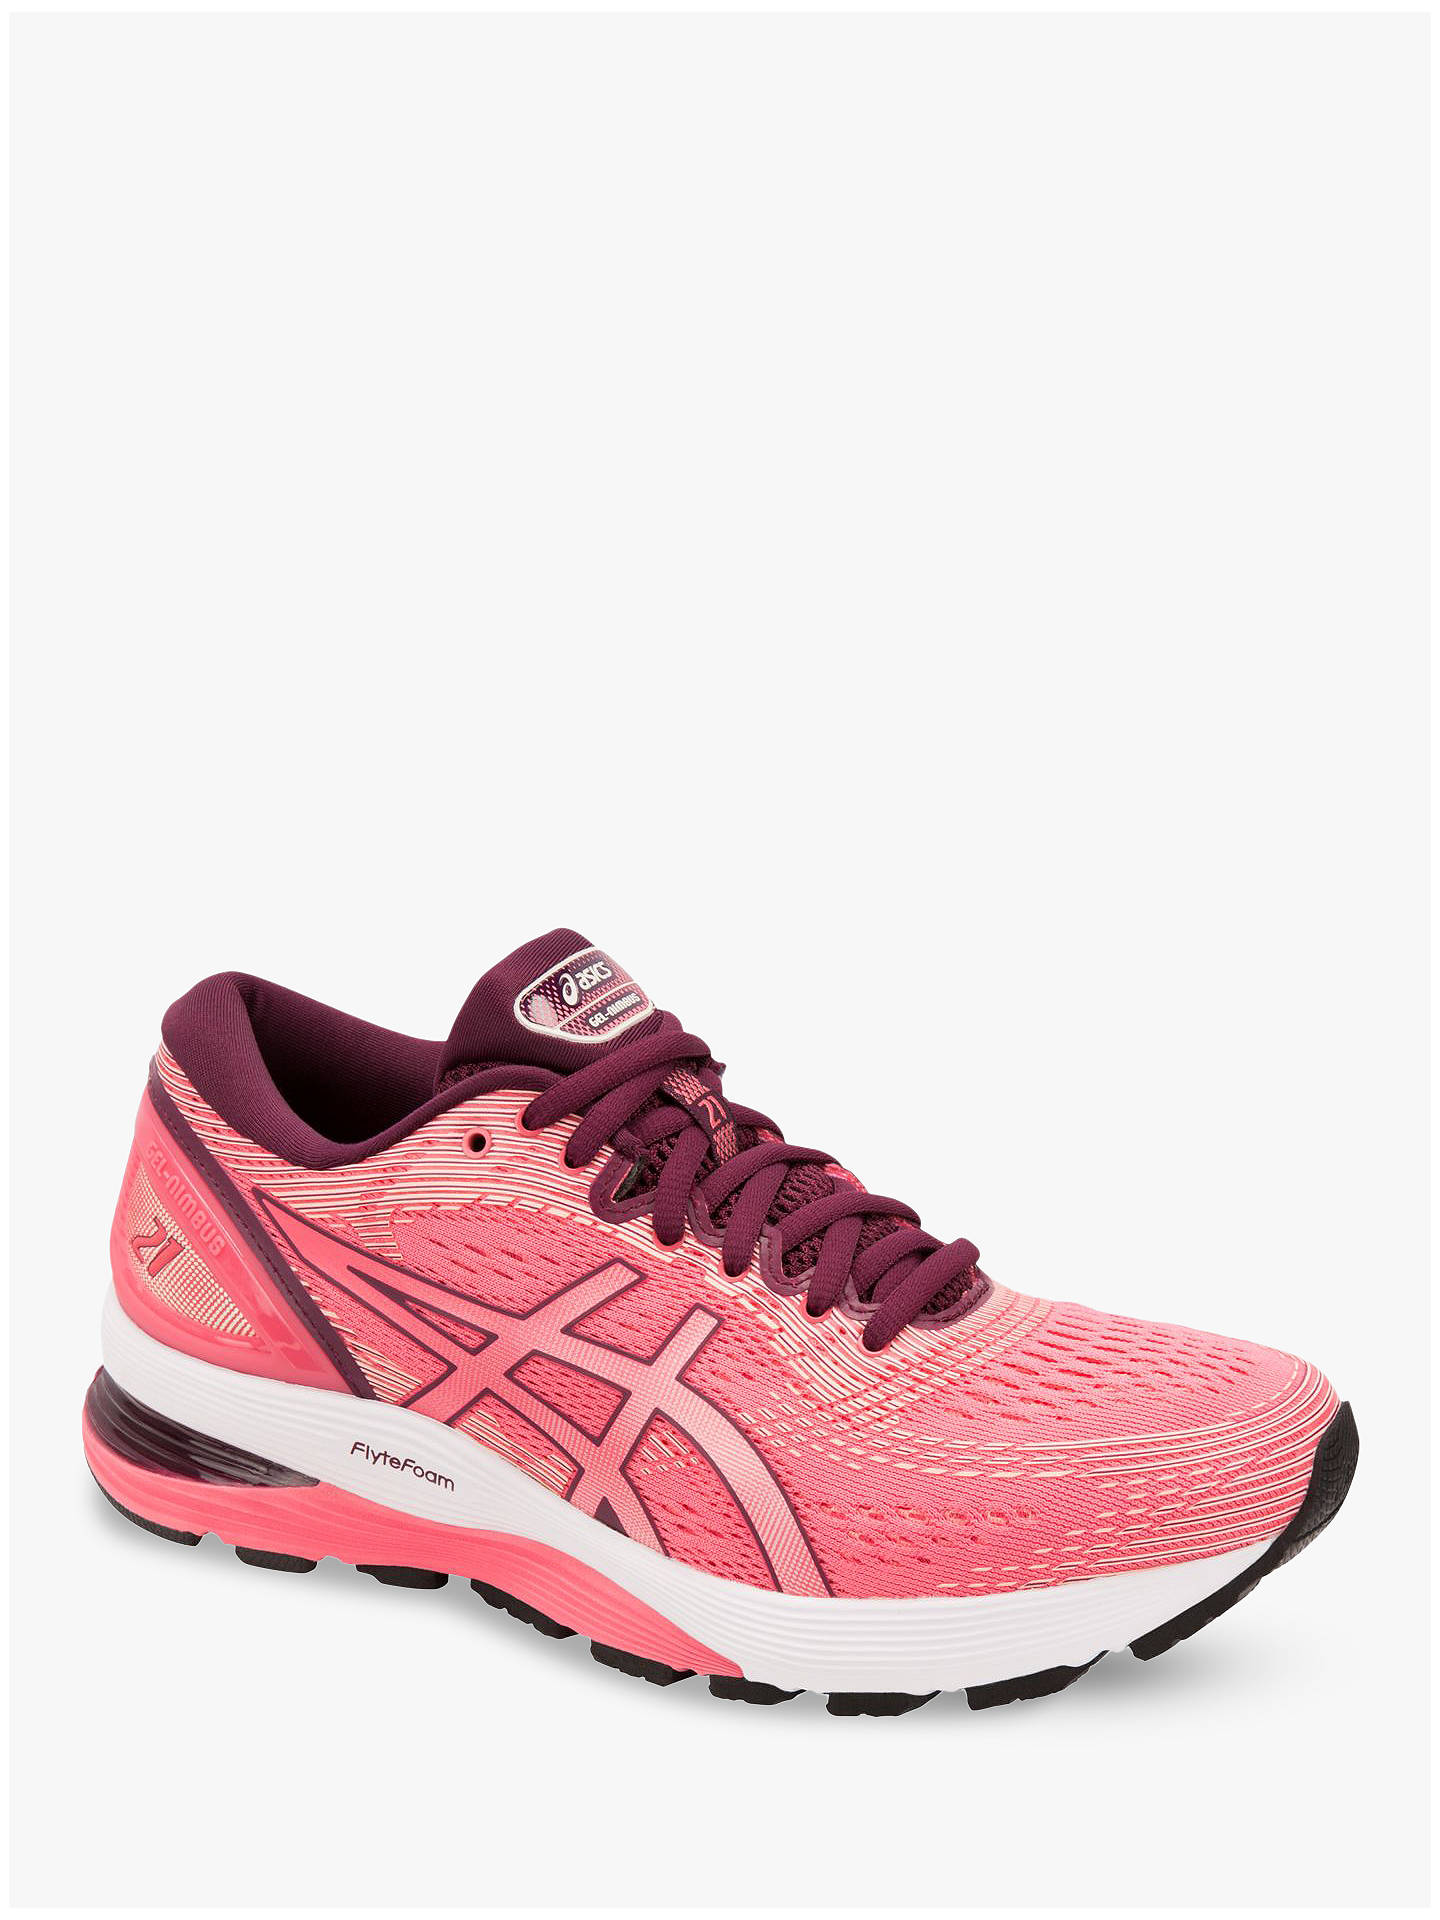 9e7db507e9f ... Buy ASICS GEL-NIMBUS 21 Women's Running Shoes, Pink Cameo/Baked Pink,  ...